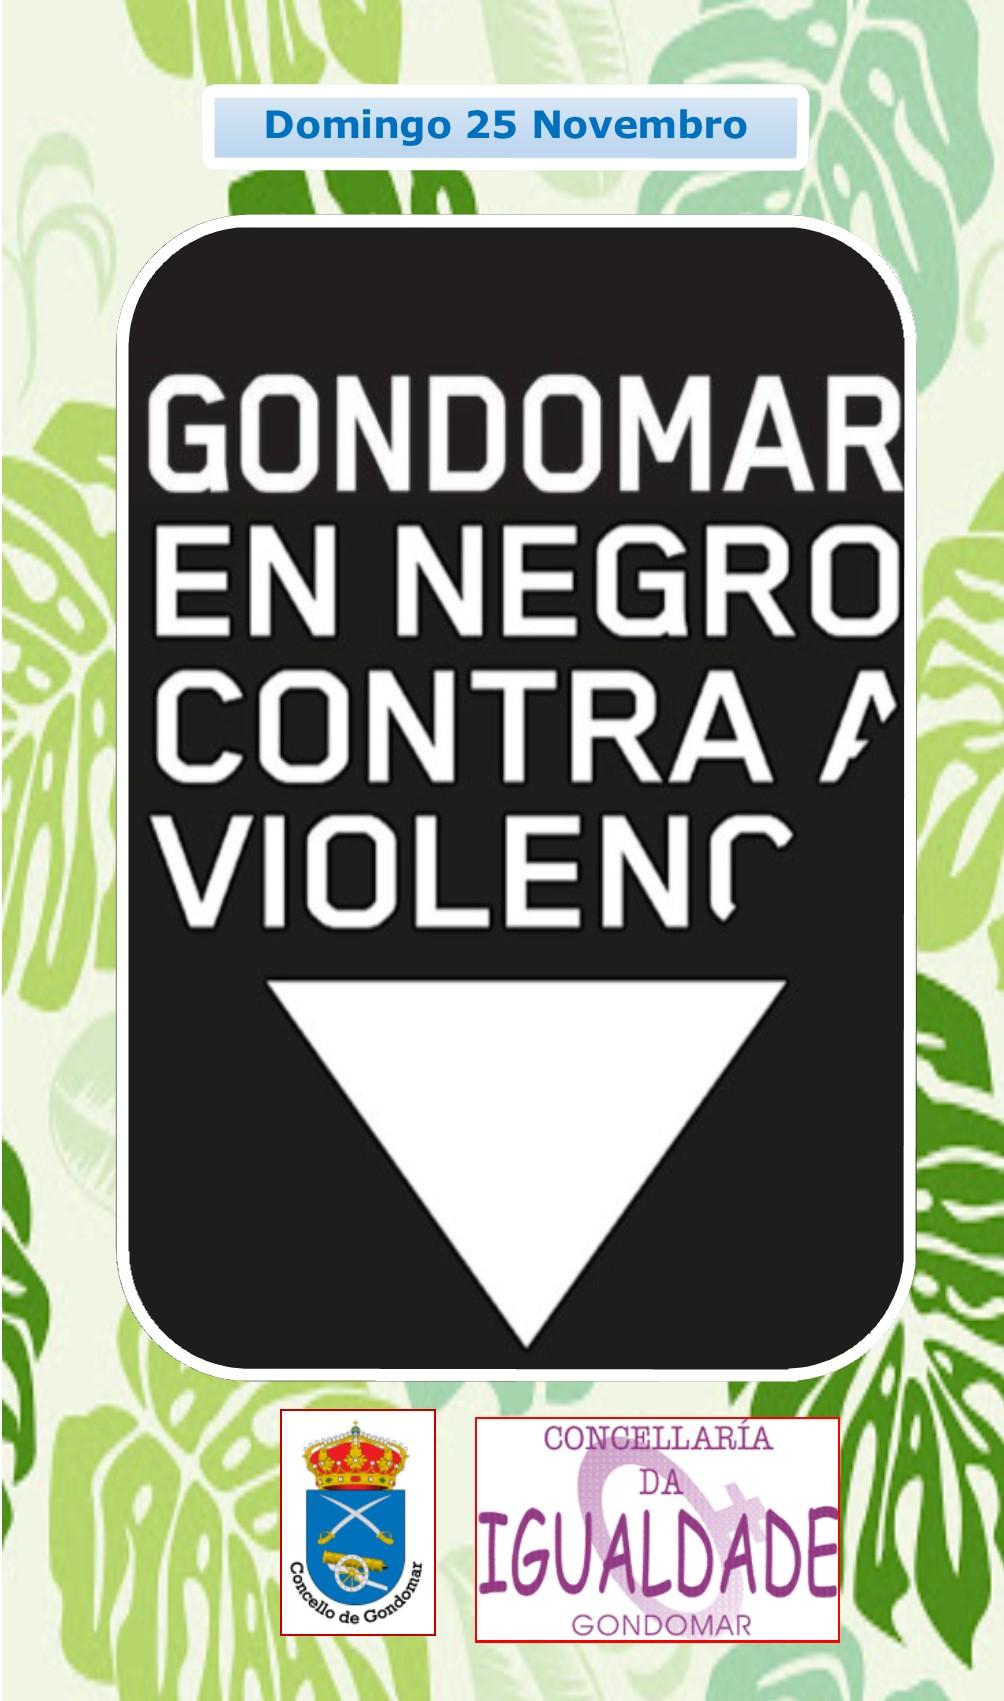 2018-10-03 – 16 – 181125_Promo_Gondomar_en_negro